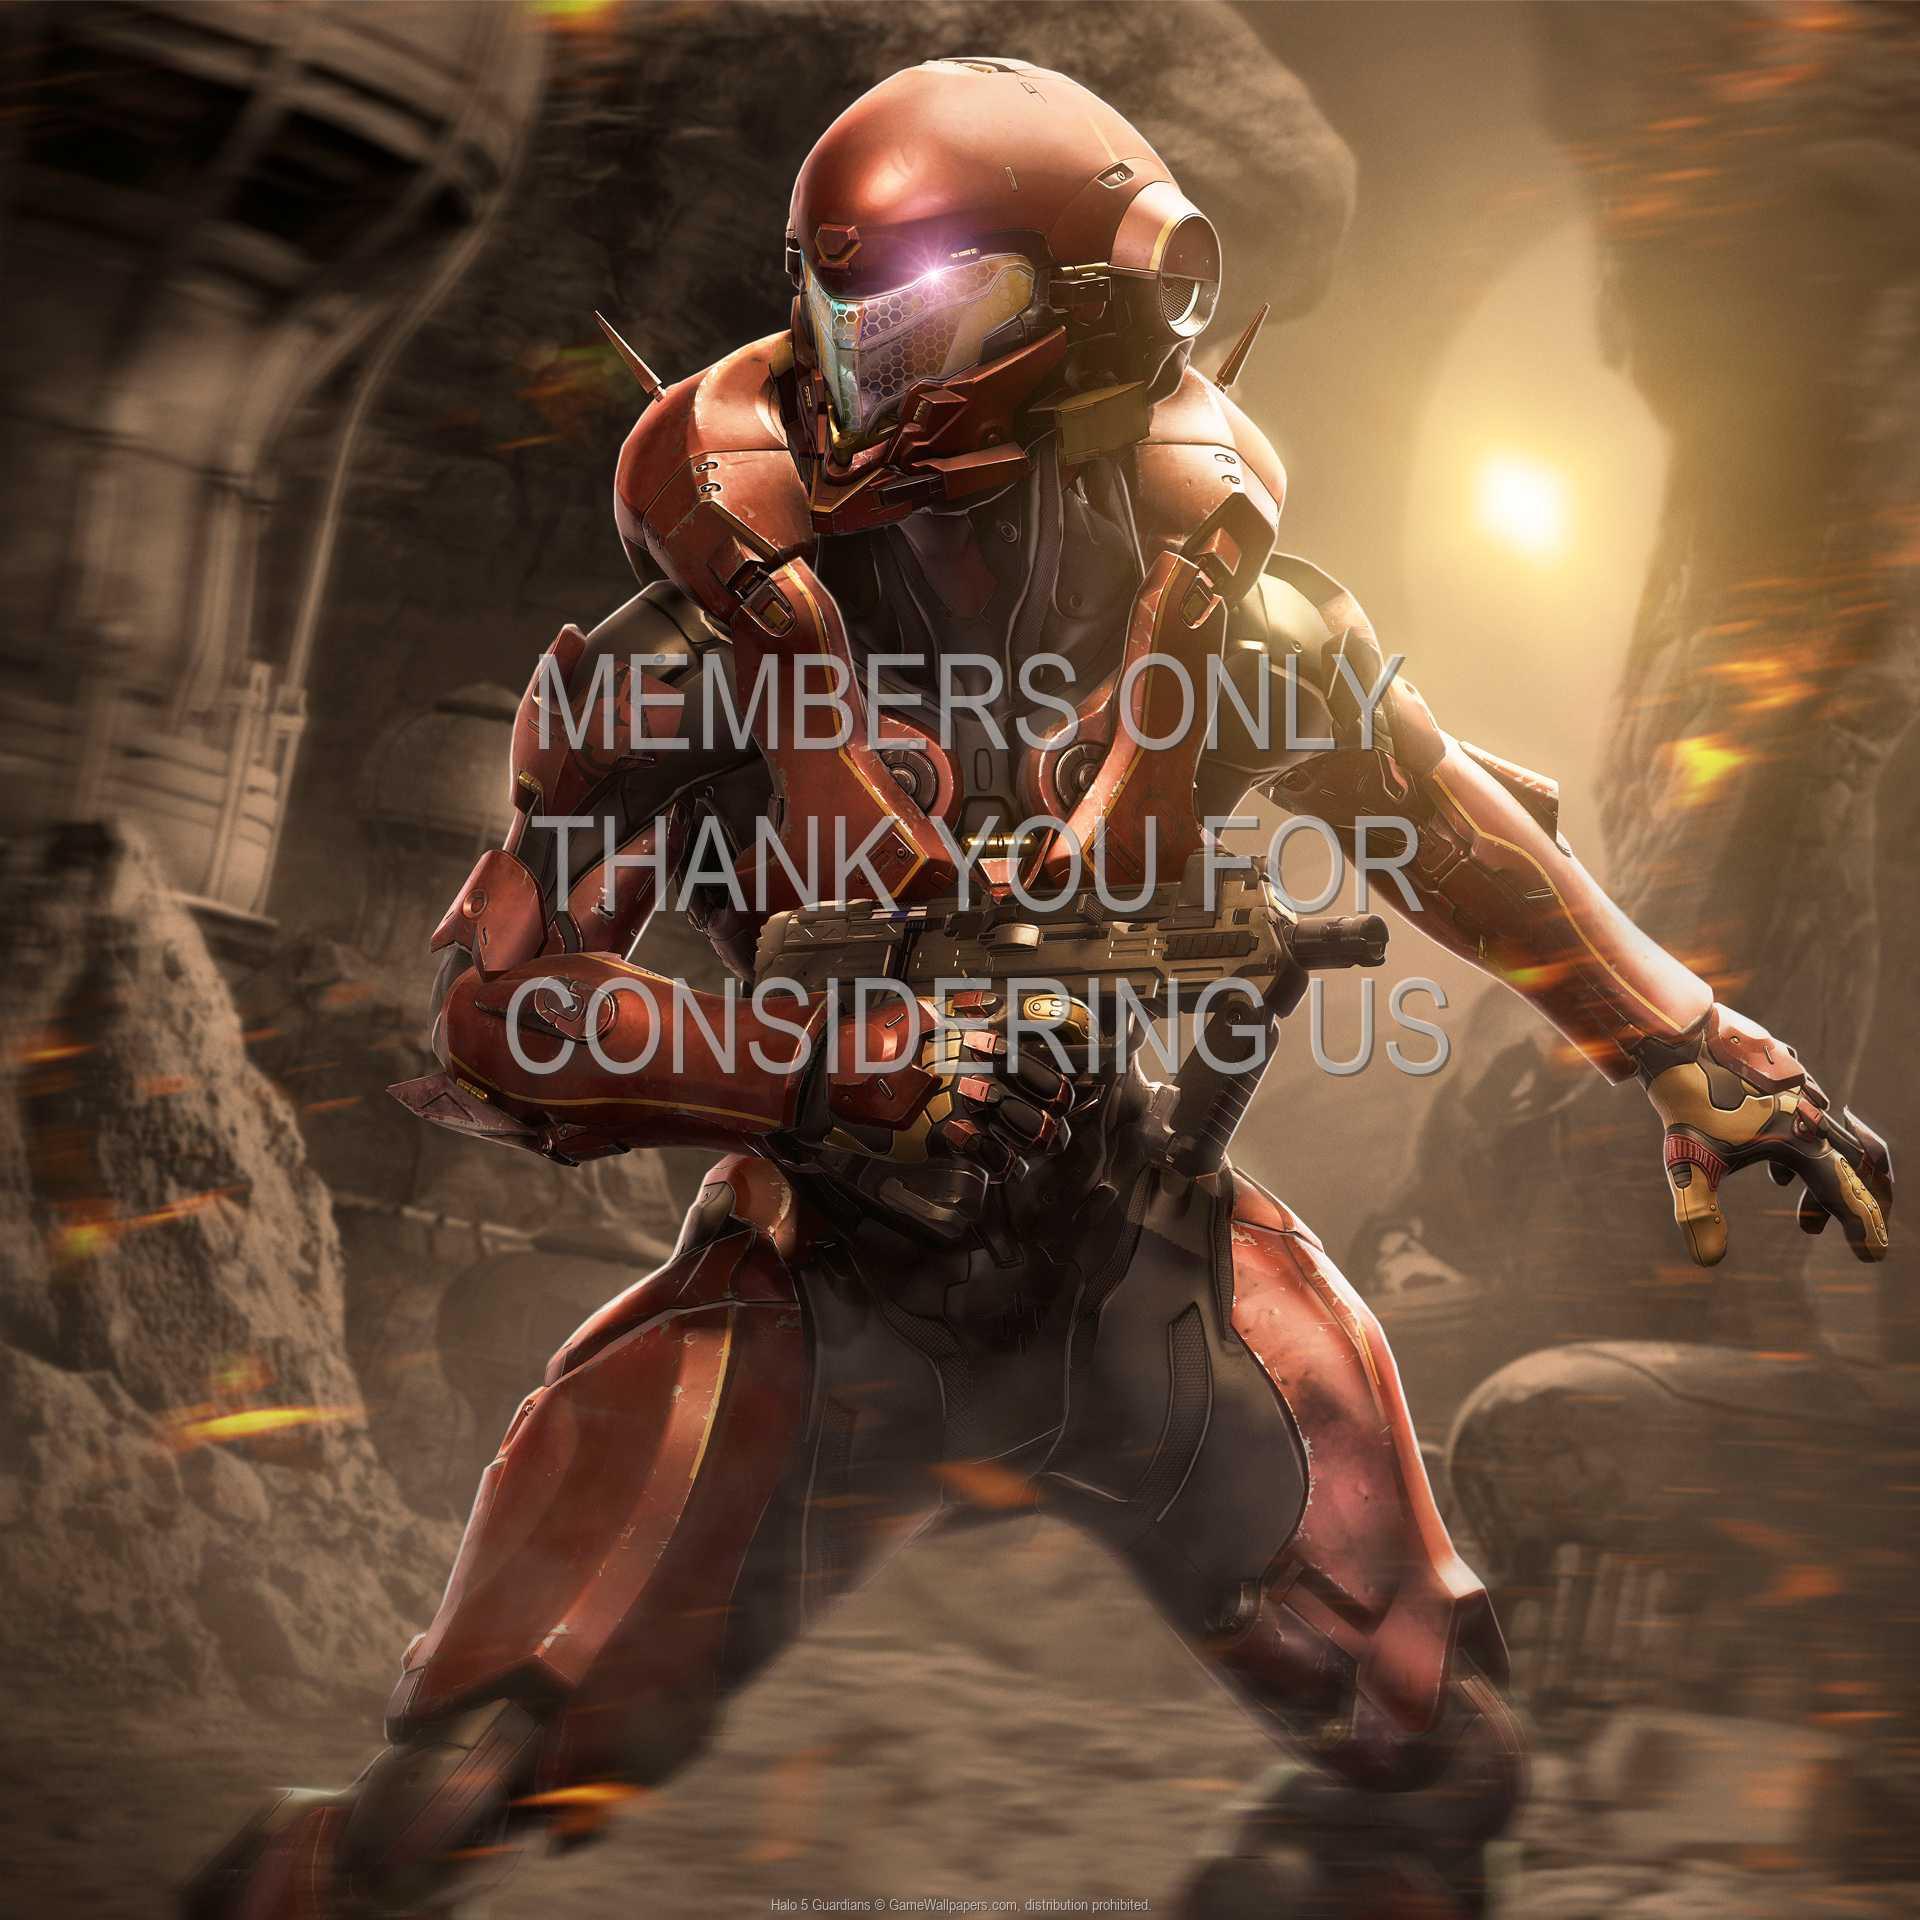 Halo 5: Guardians 1080p Horizontal Handy Hintergrundbild 03